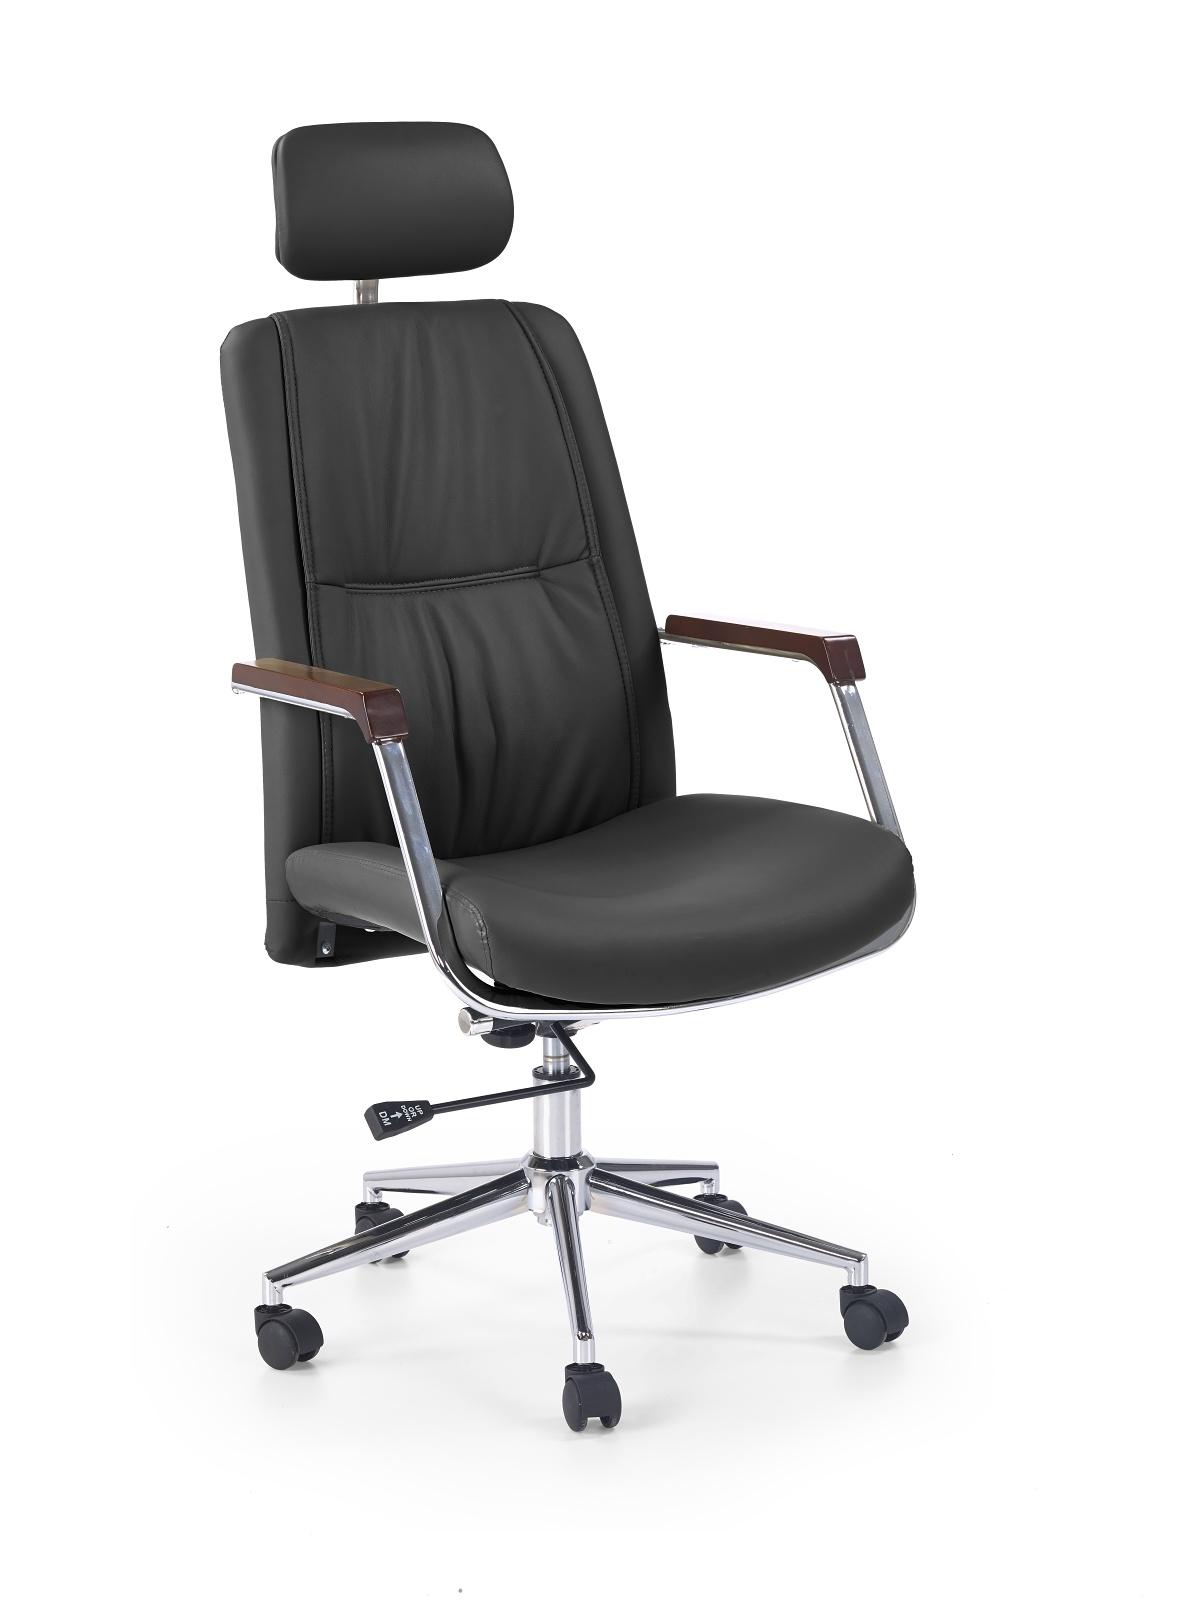 Kancelárske kreslo - Halmar - Patric čierna